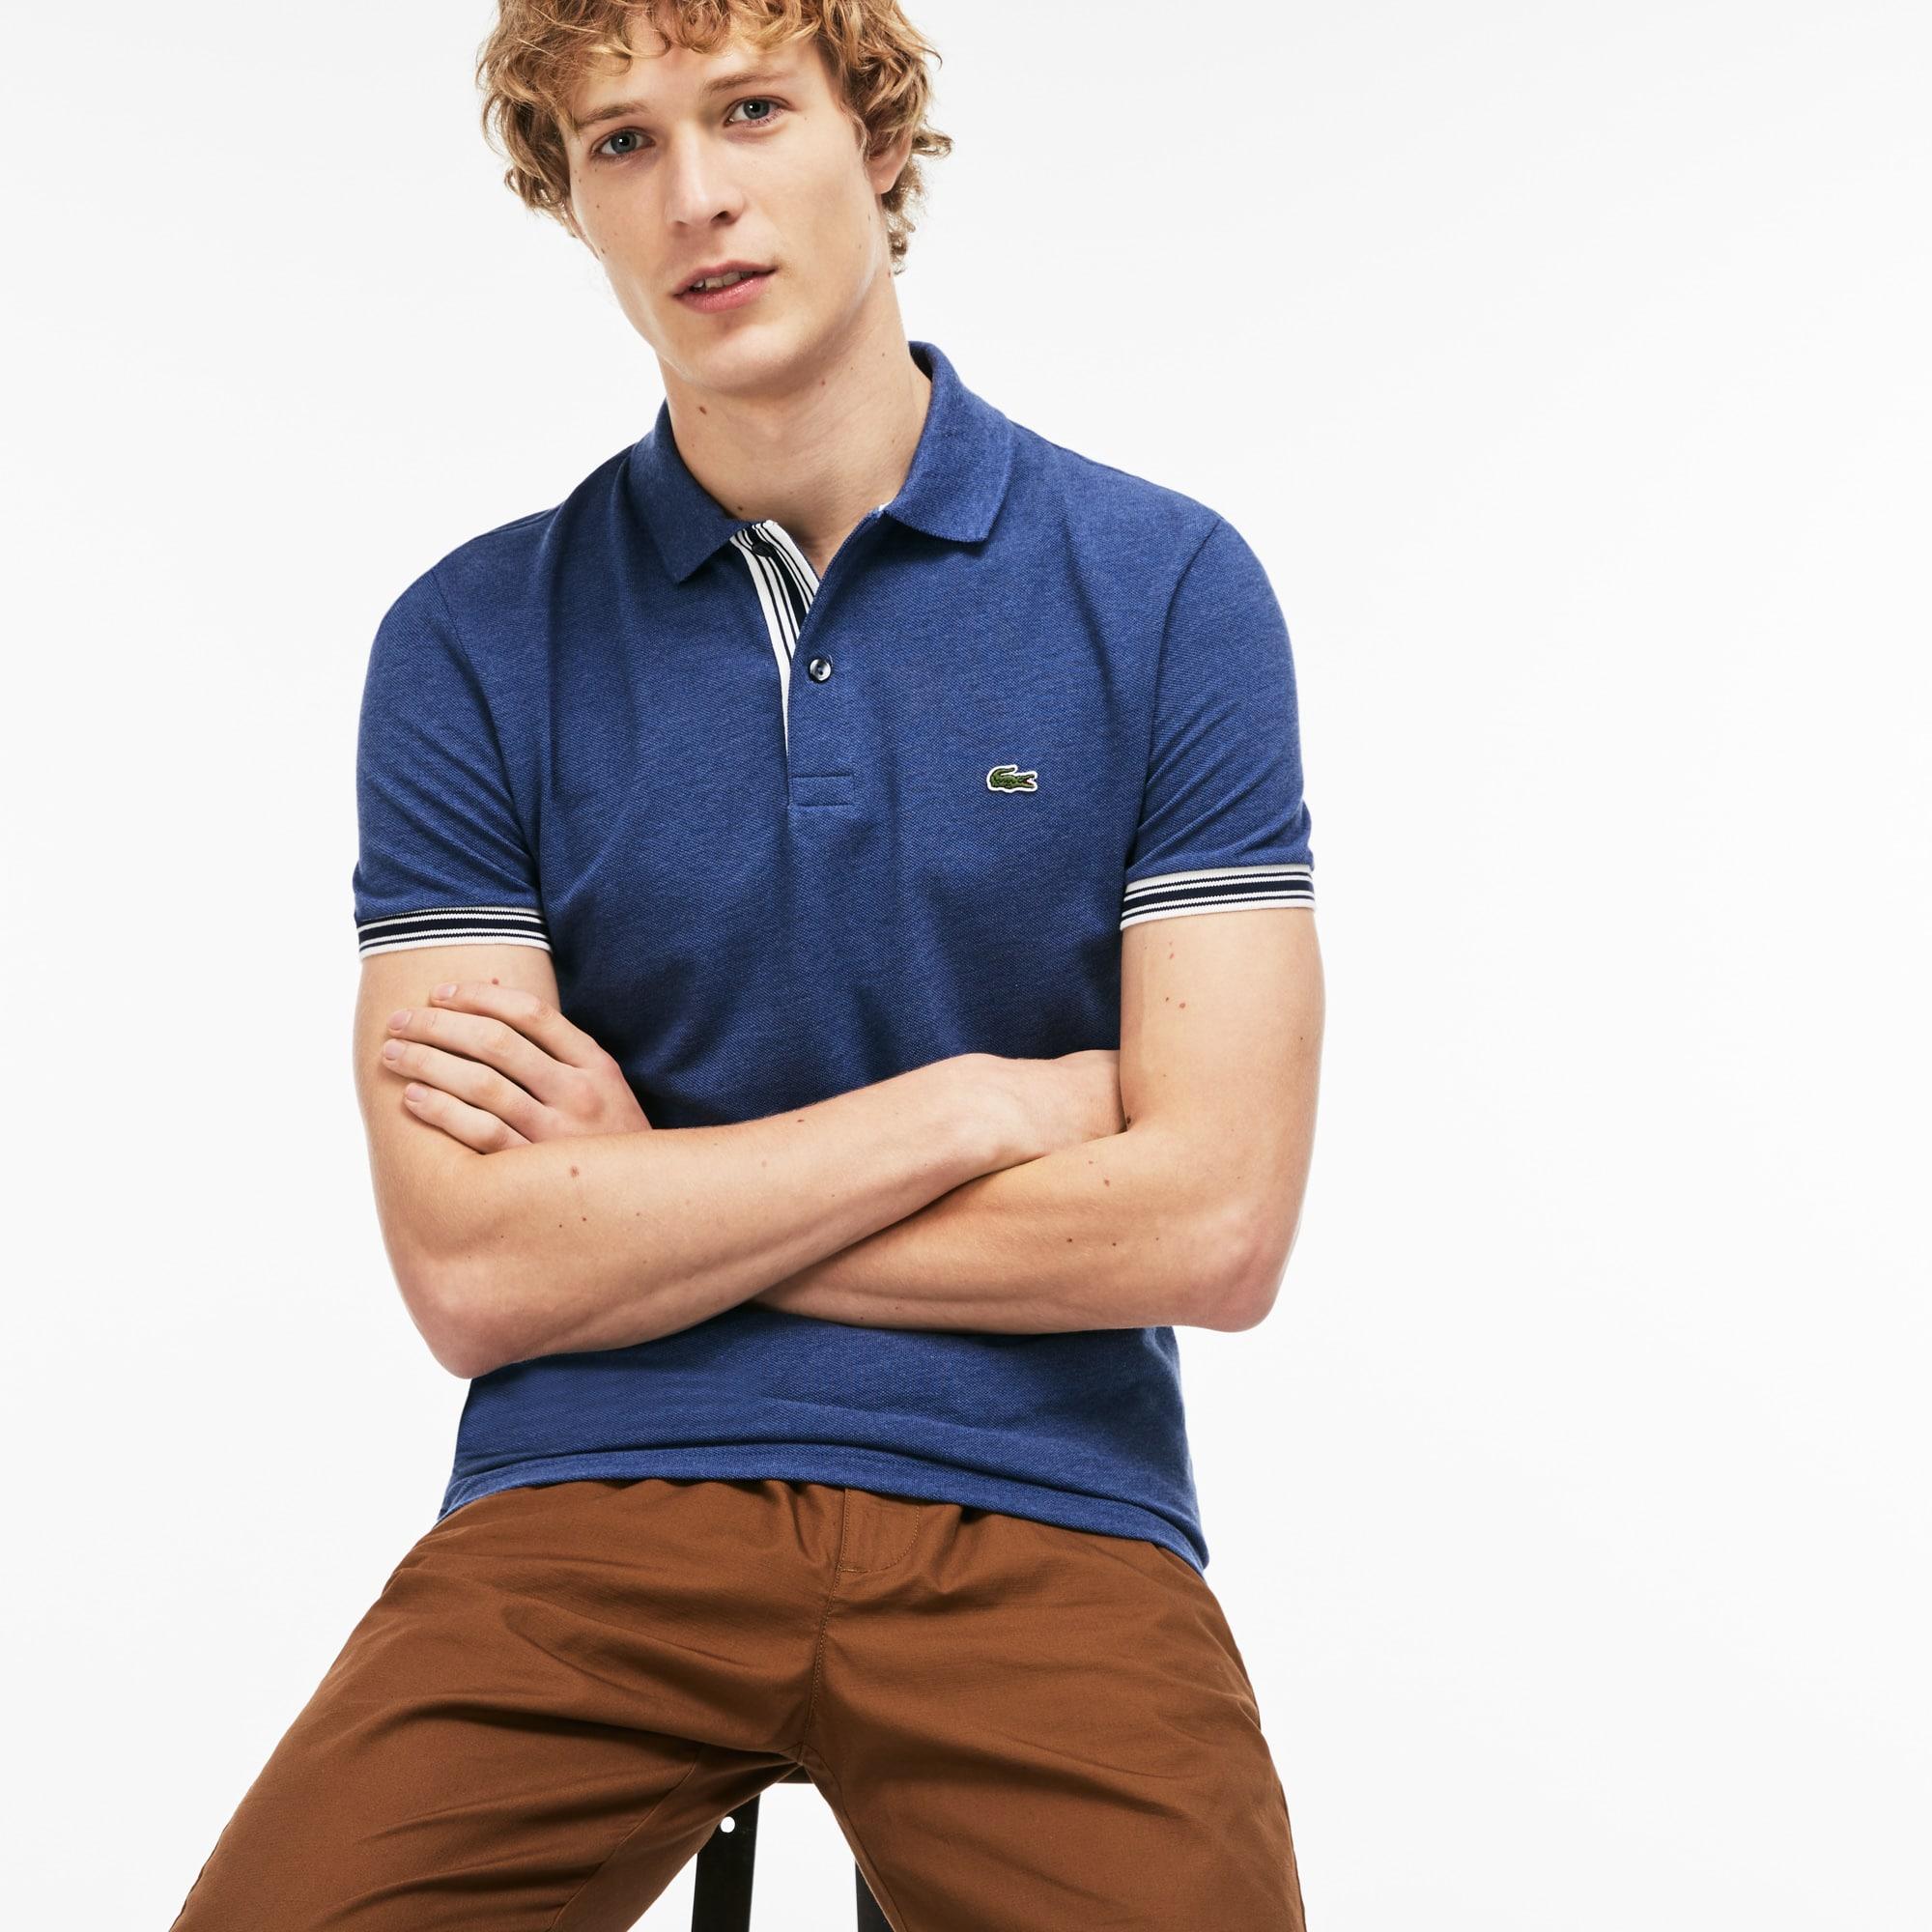 Slim Fit Herren-Poloshirt aus Petit Piqué mit Paspeln LACOSTE